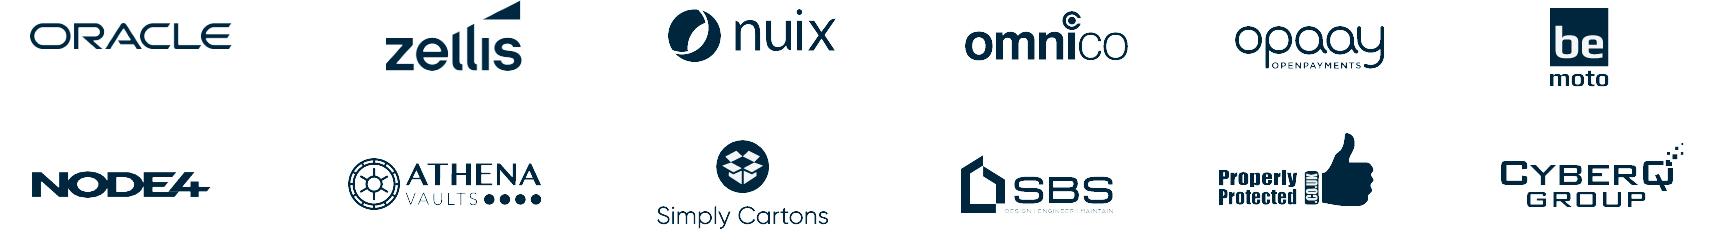 SSM Client Logos